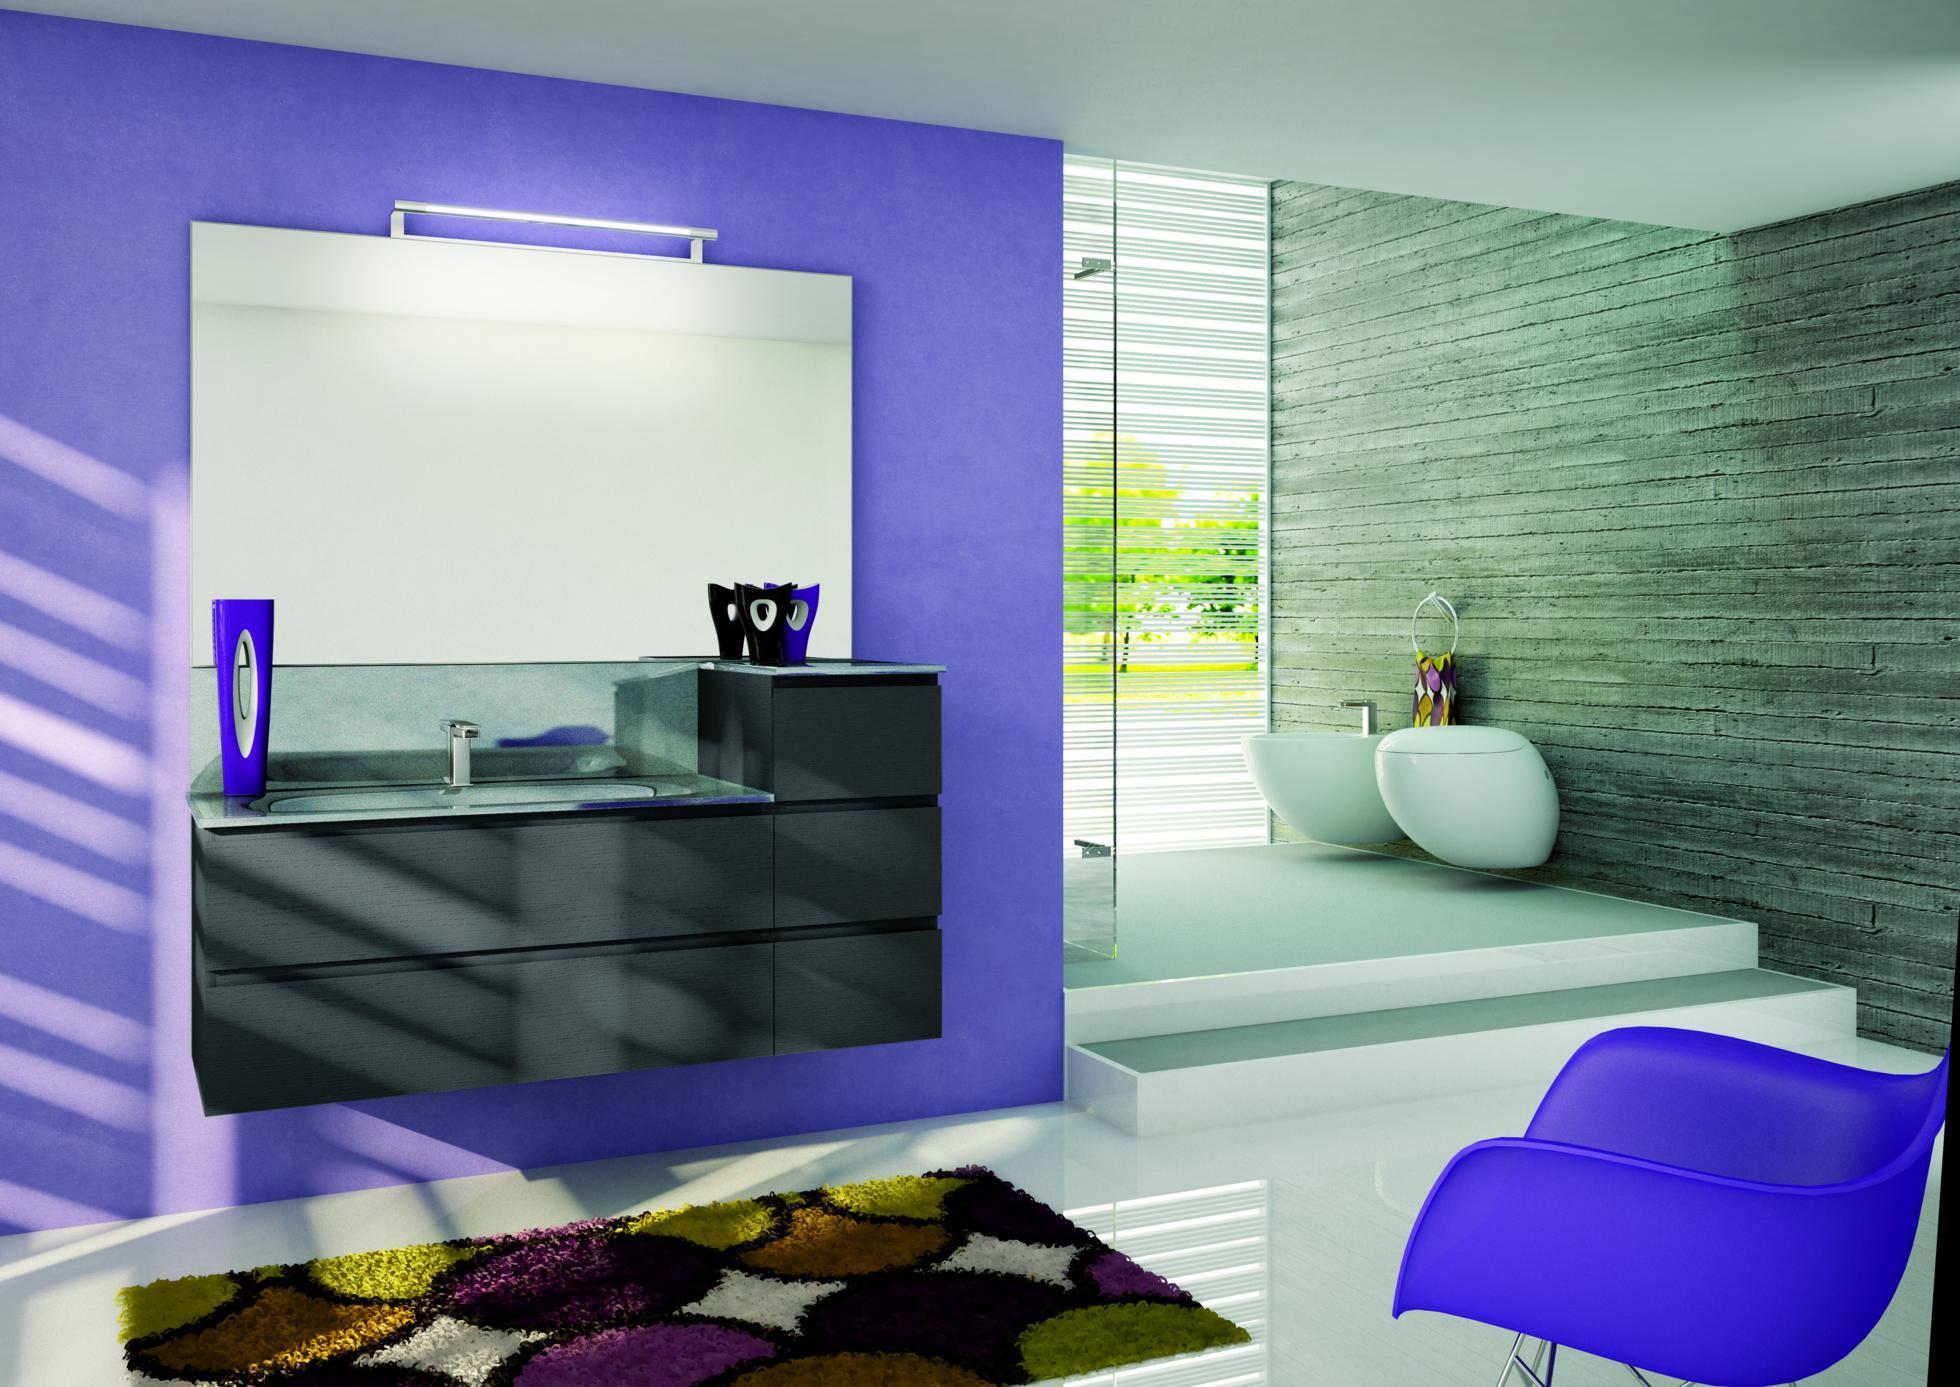 bagno-parete-viola